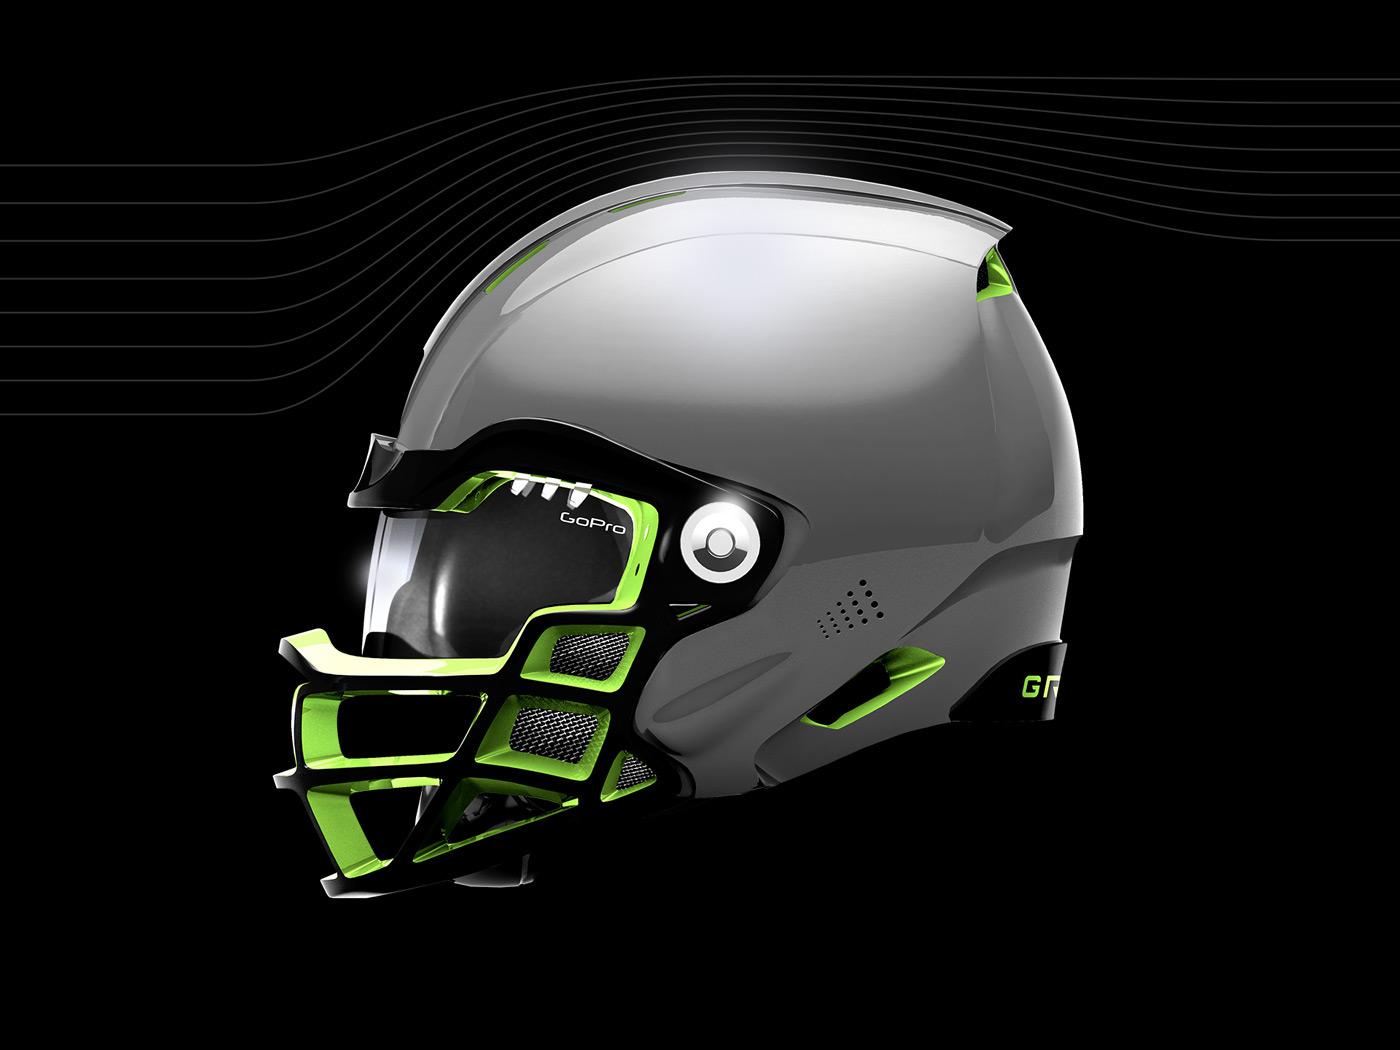 af3e7457a0c Future Football Helmet Design Case Study on Behance